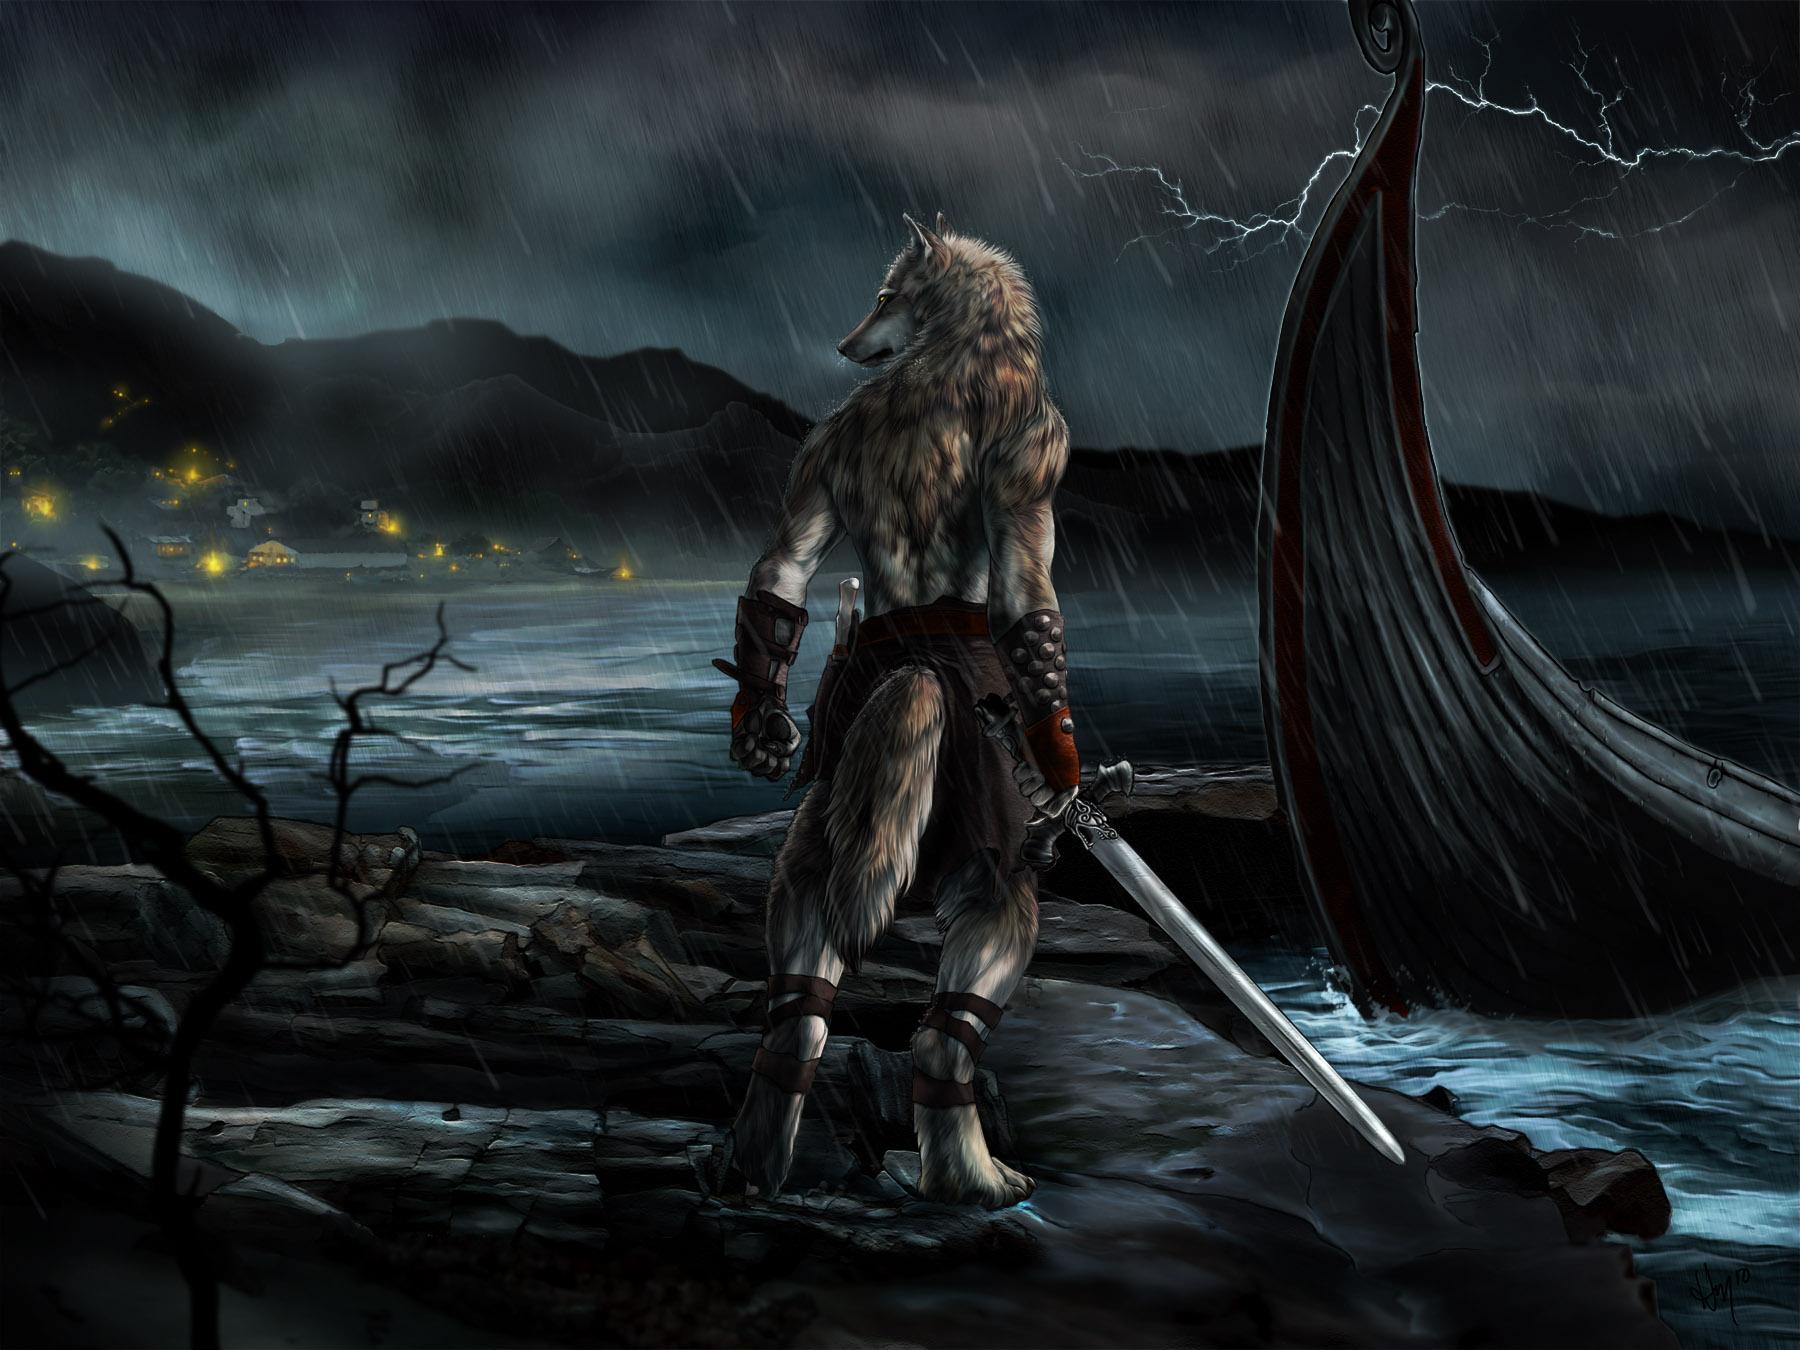 Download Dark Werewolf Wallpaper 1800x1350 Wallpoper 223053 1800x1350